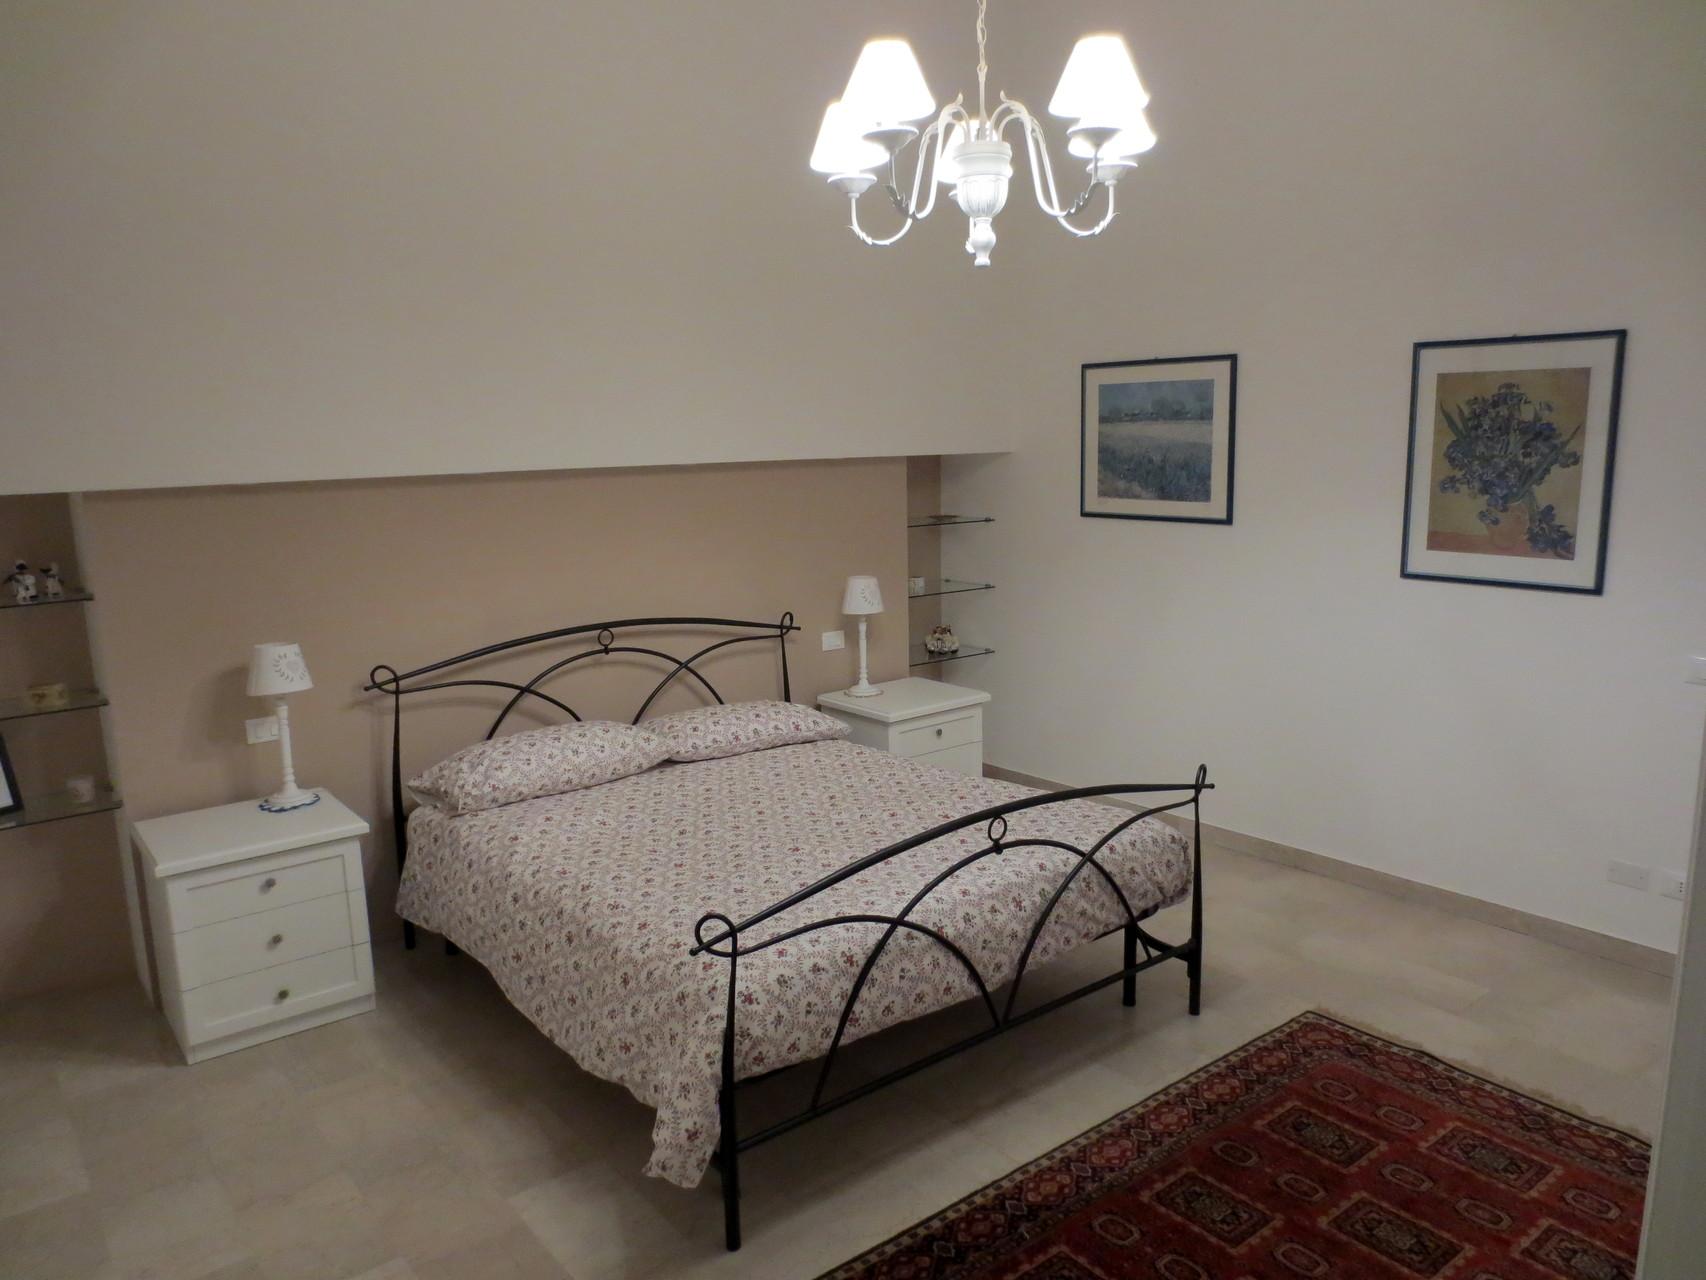 camera matrimoniale bedroom benvenuti su antica residenza adua verona. Black Bedroom Furniture Sets. Home Design Ideas